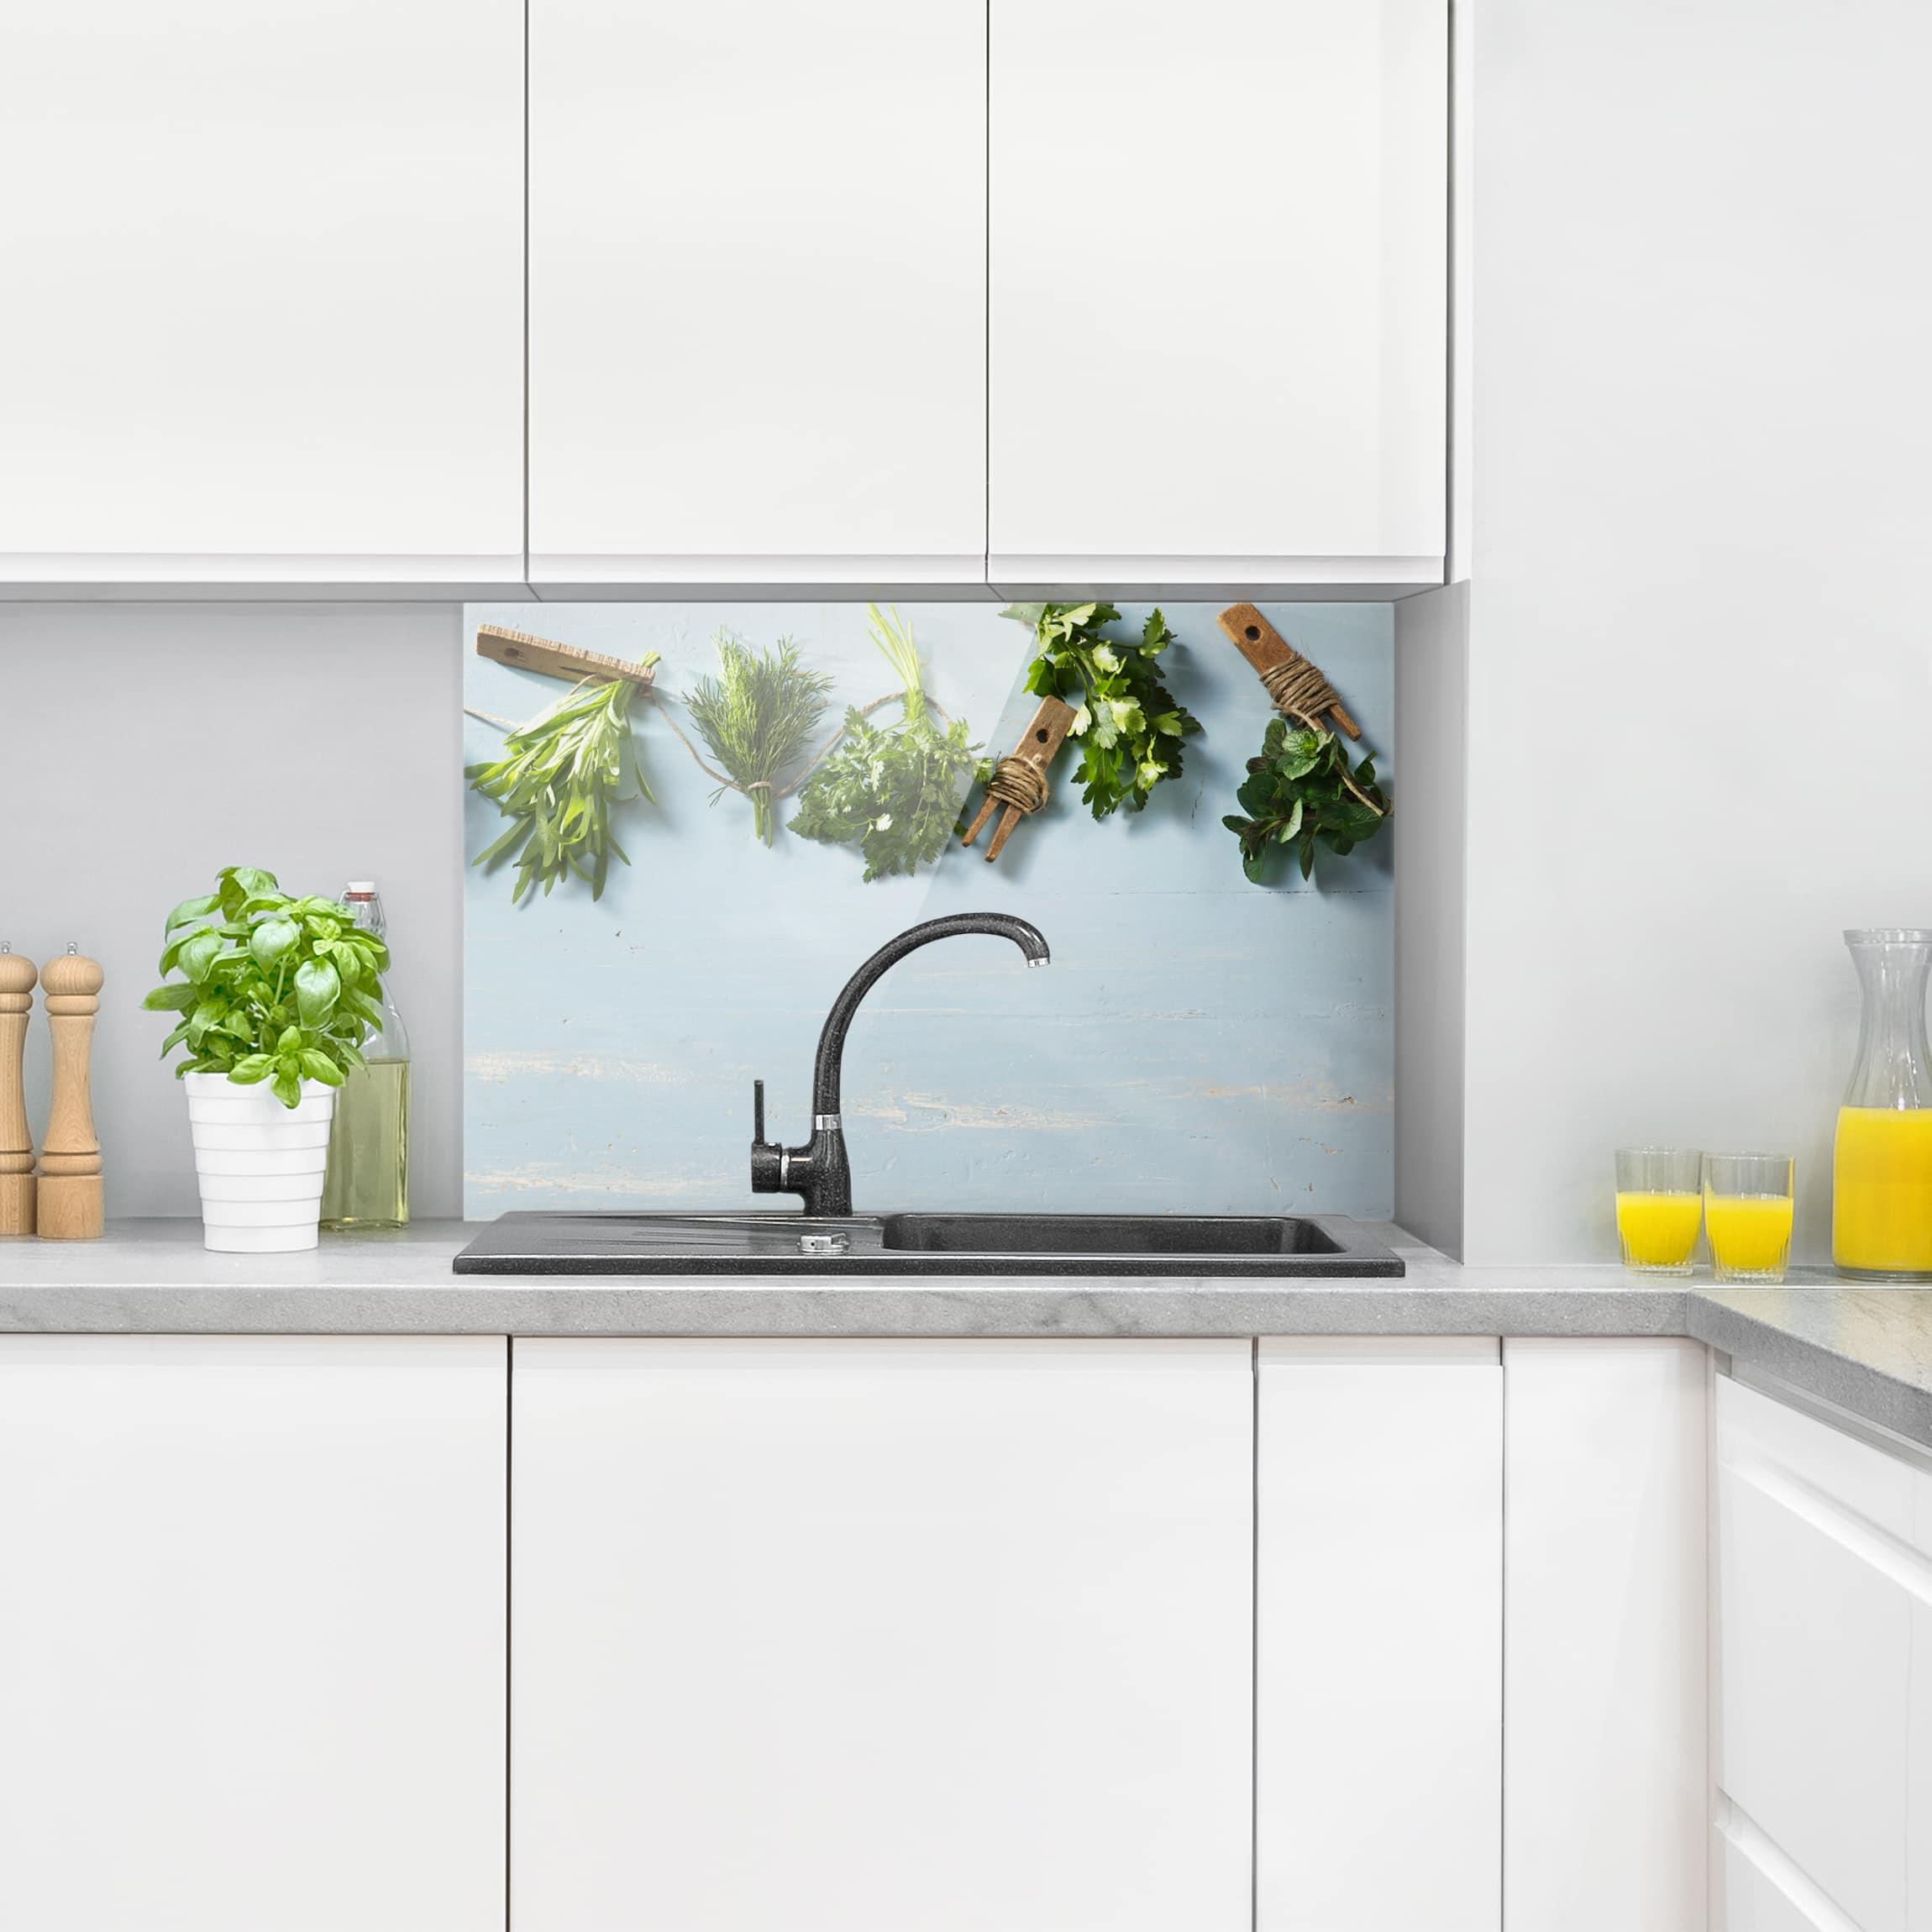 spritzschutz glas geb ndelte kr uter quer 2 3. Black Bedroom Furniture Sets. Home Design Ideas